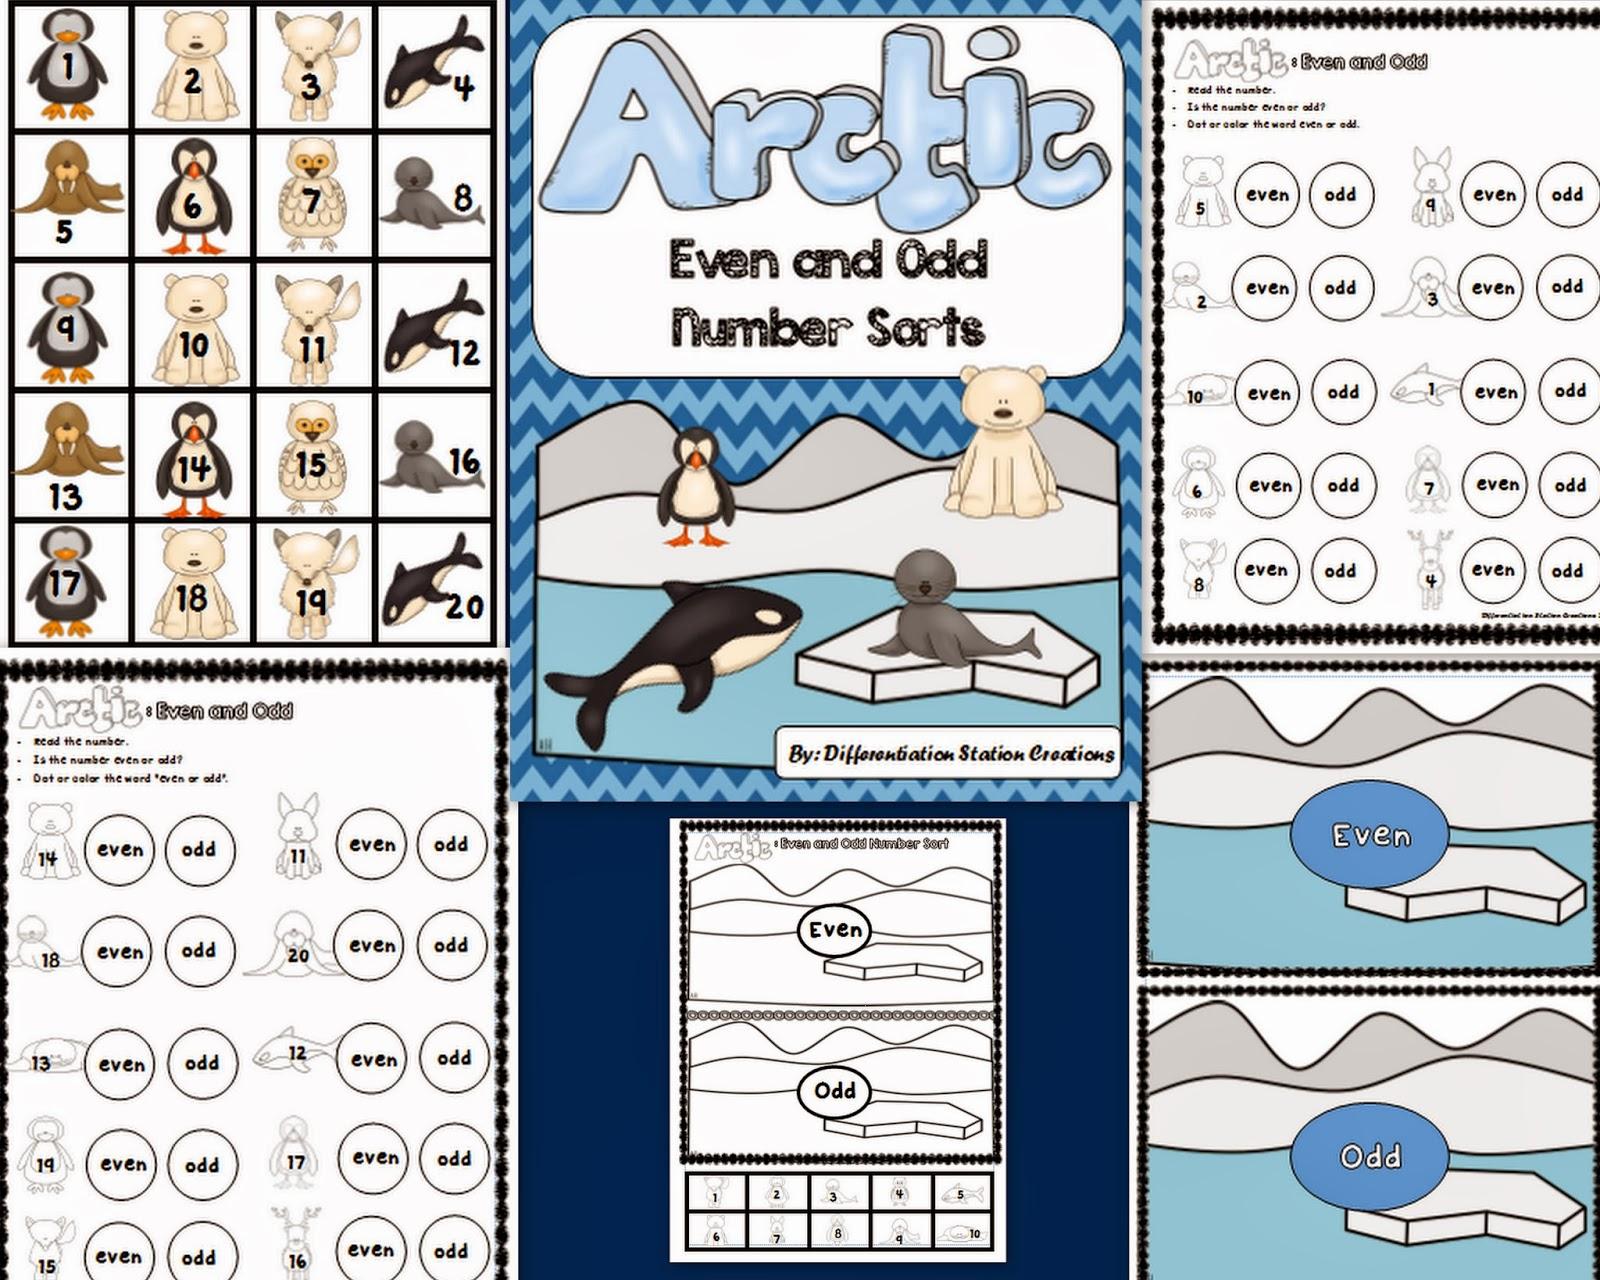 http://www.teacherspayteachers.com/Product/FREE-Arctic-Even-and-Odd-Number-Sort-Center-Printables-1096488